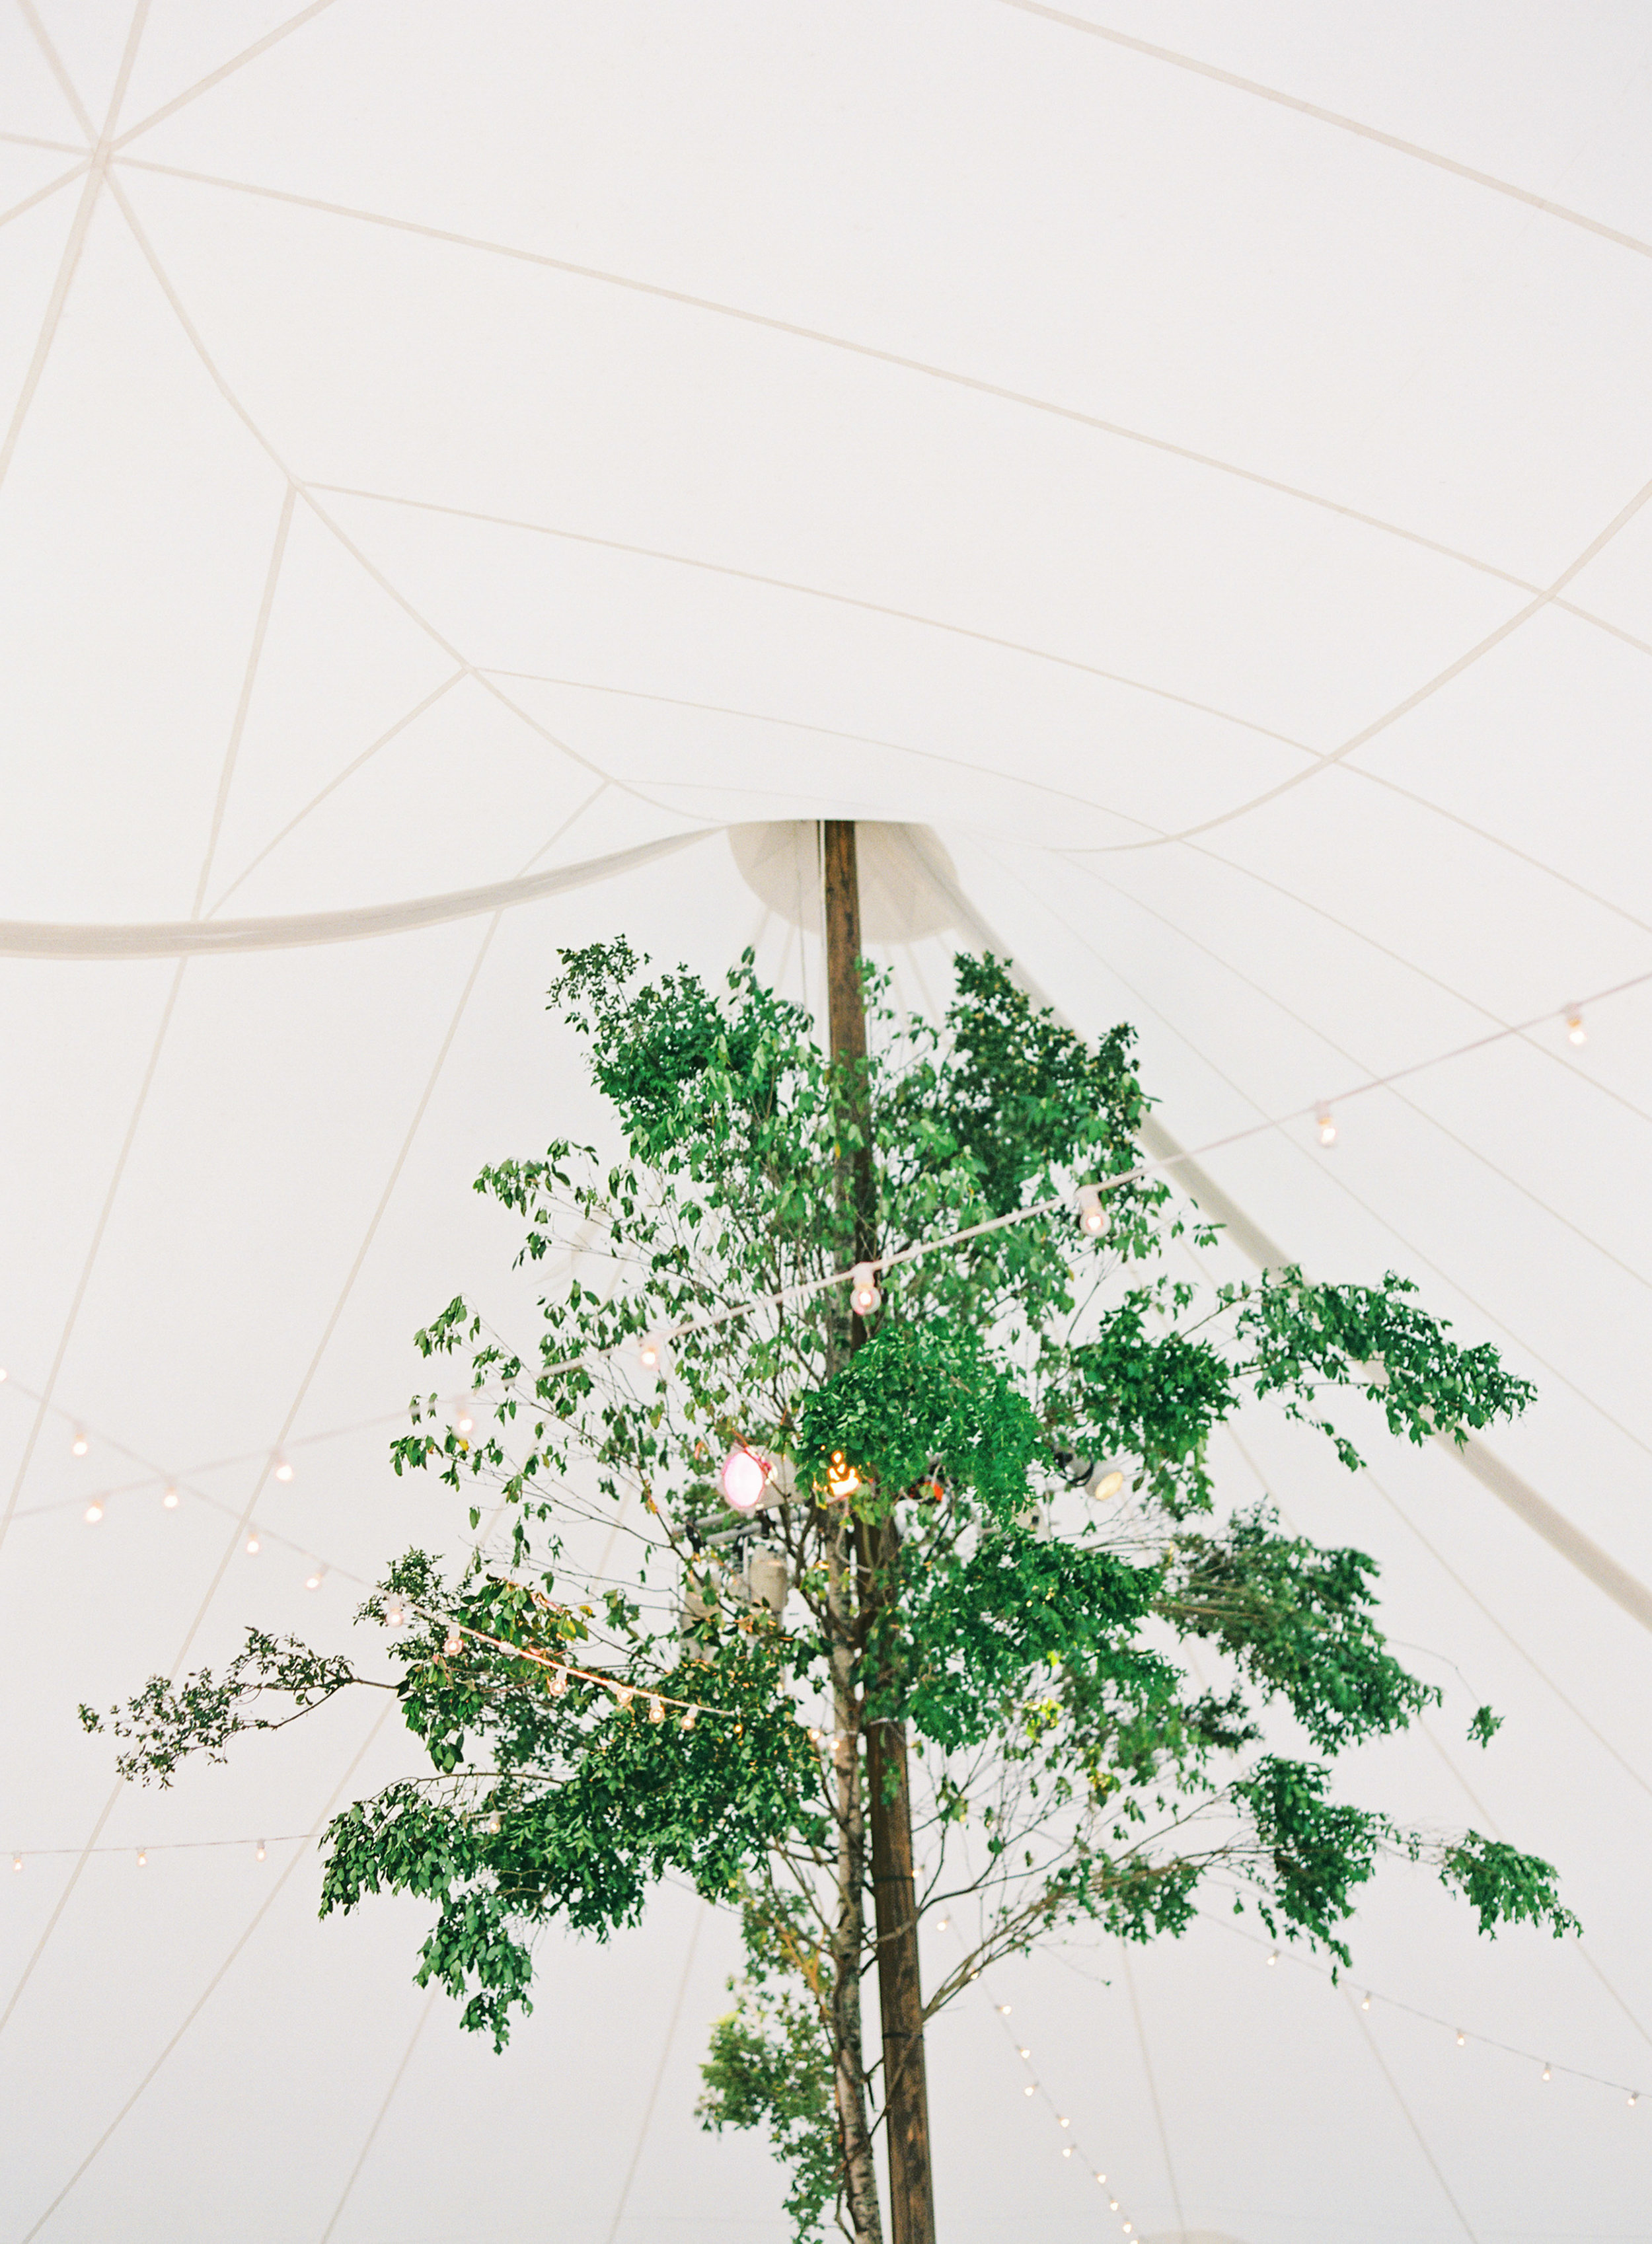 Ankony_Farm_Wedding-241-Jen-Huang-AS-294-Jen-Huang-003140-R1-016.jpg